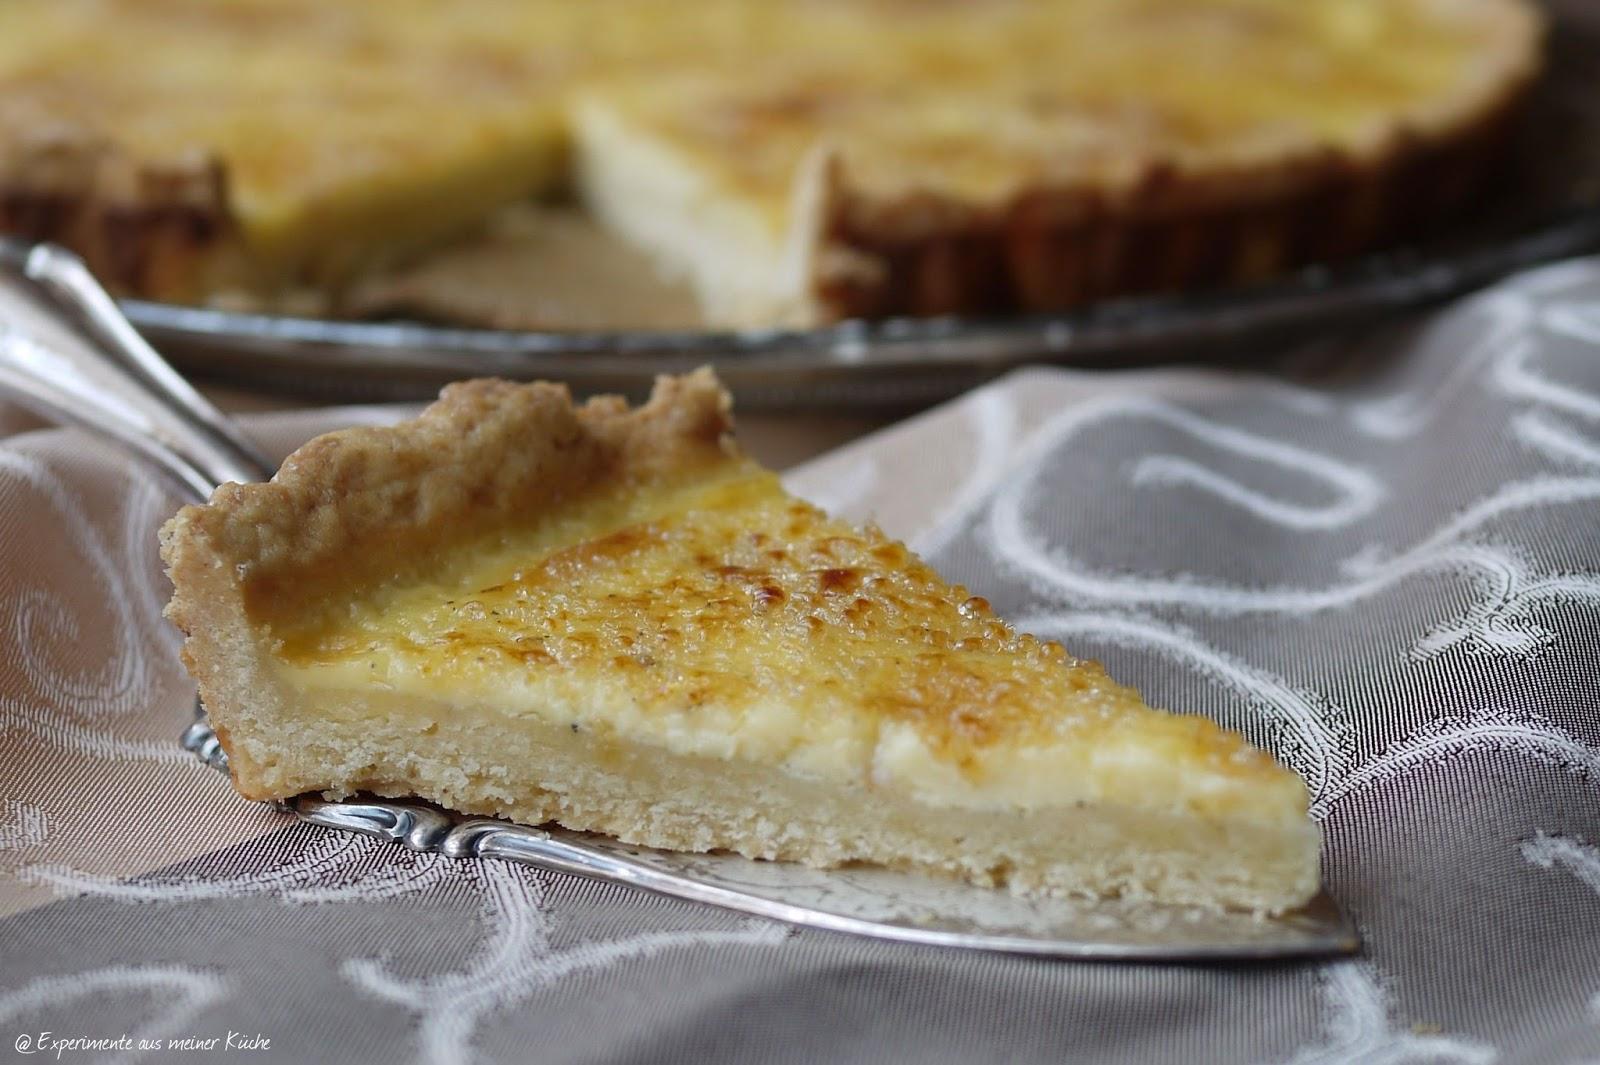 Experimente aus meiner Küche: Creme Brûlée Tarte